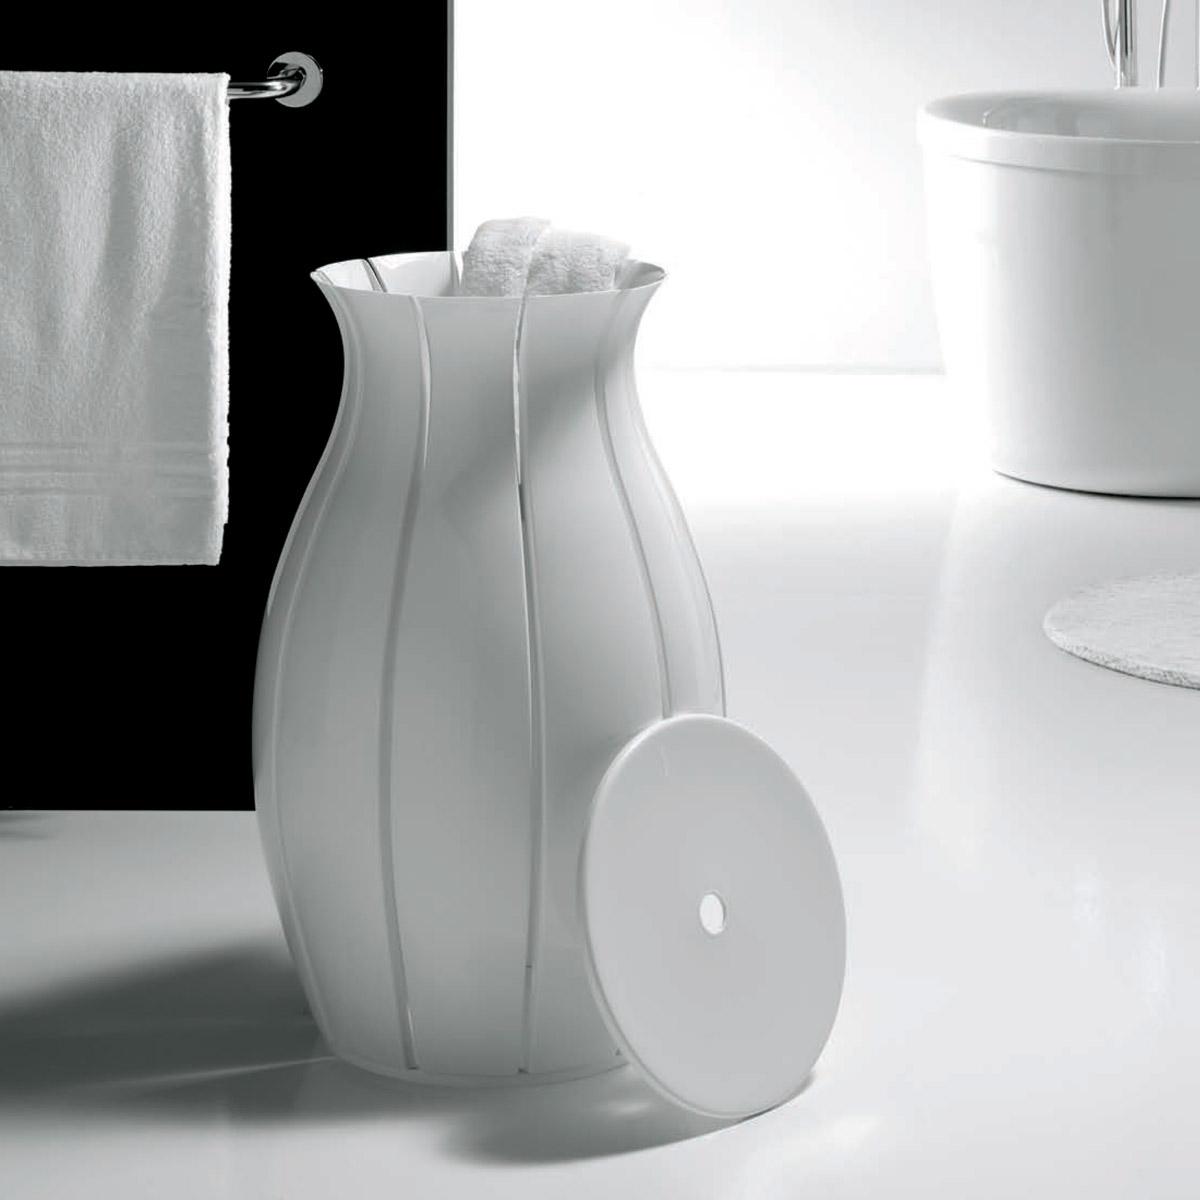 ninfea  modern sculptural laundry hamper  the green head - ninfea  modern sculptural laundry hamper